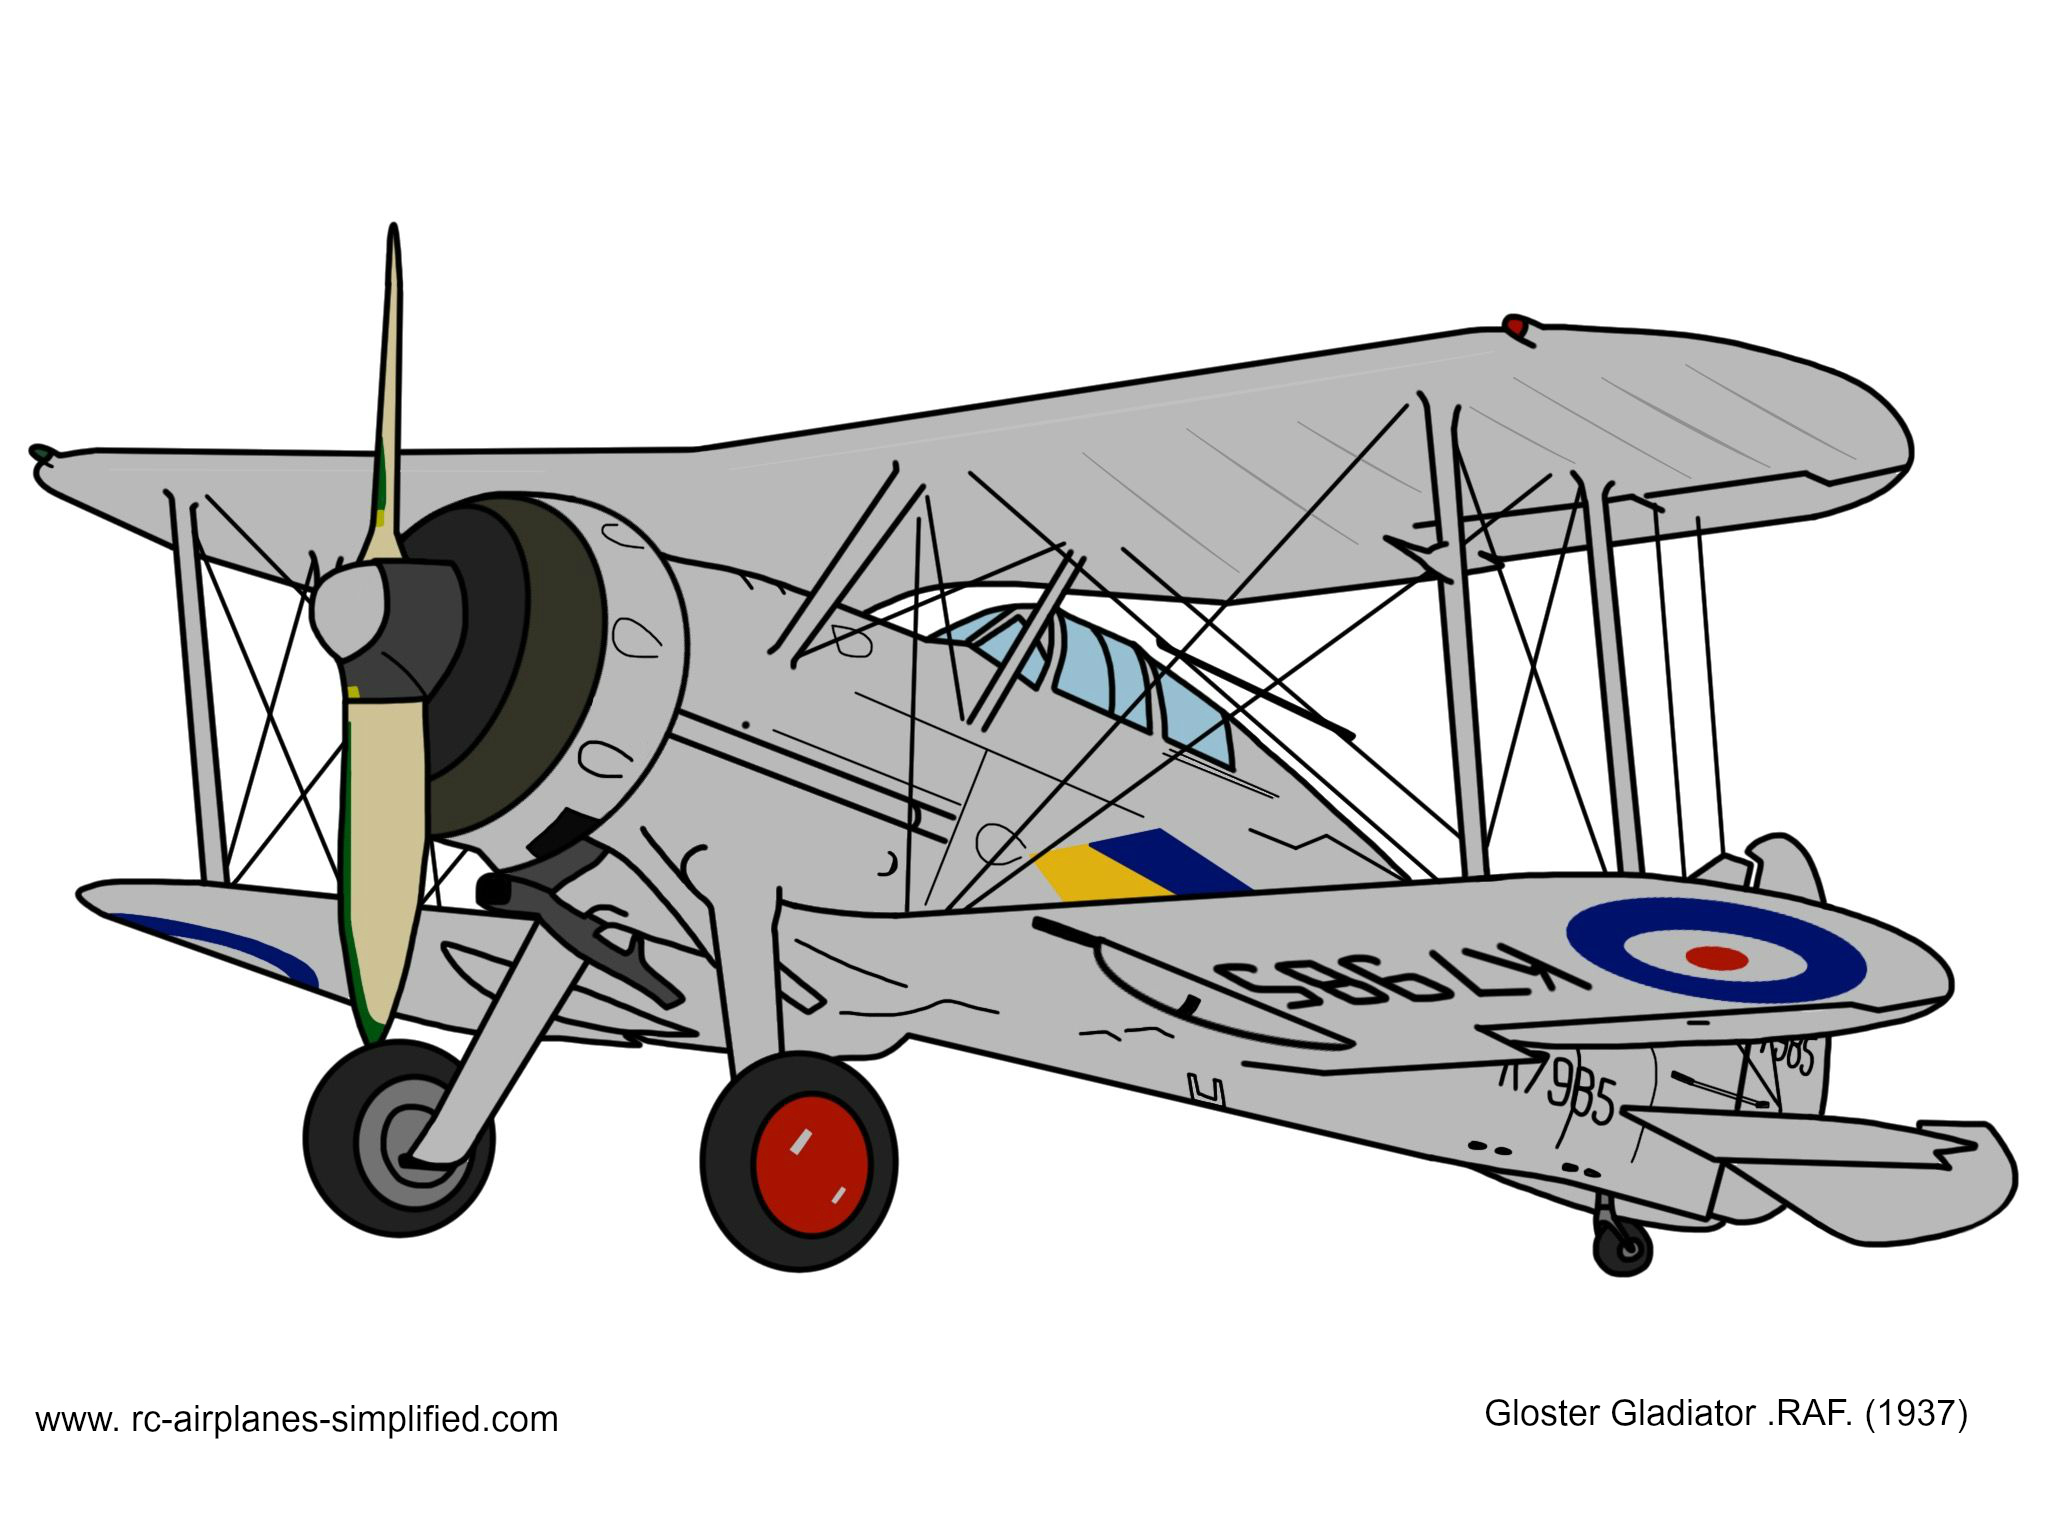 Gloster Gladiator original artwork